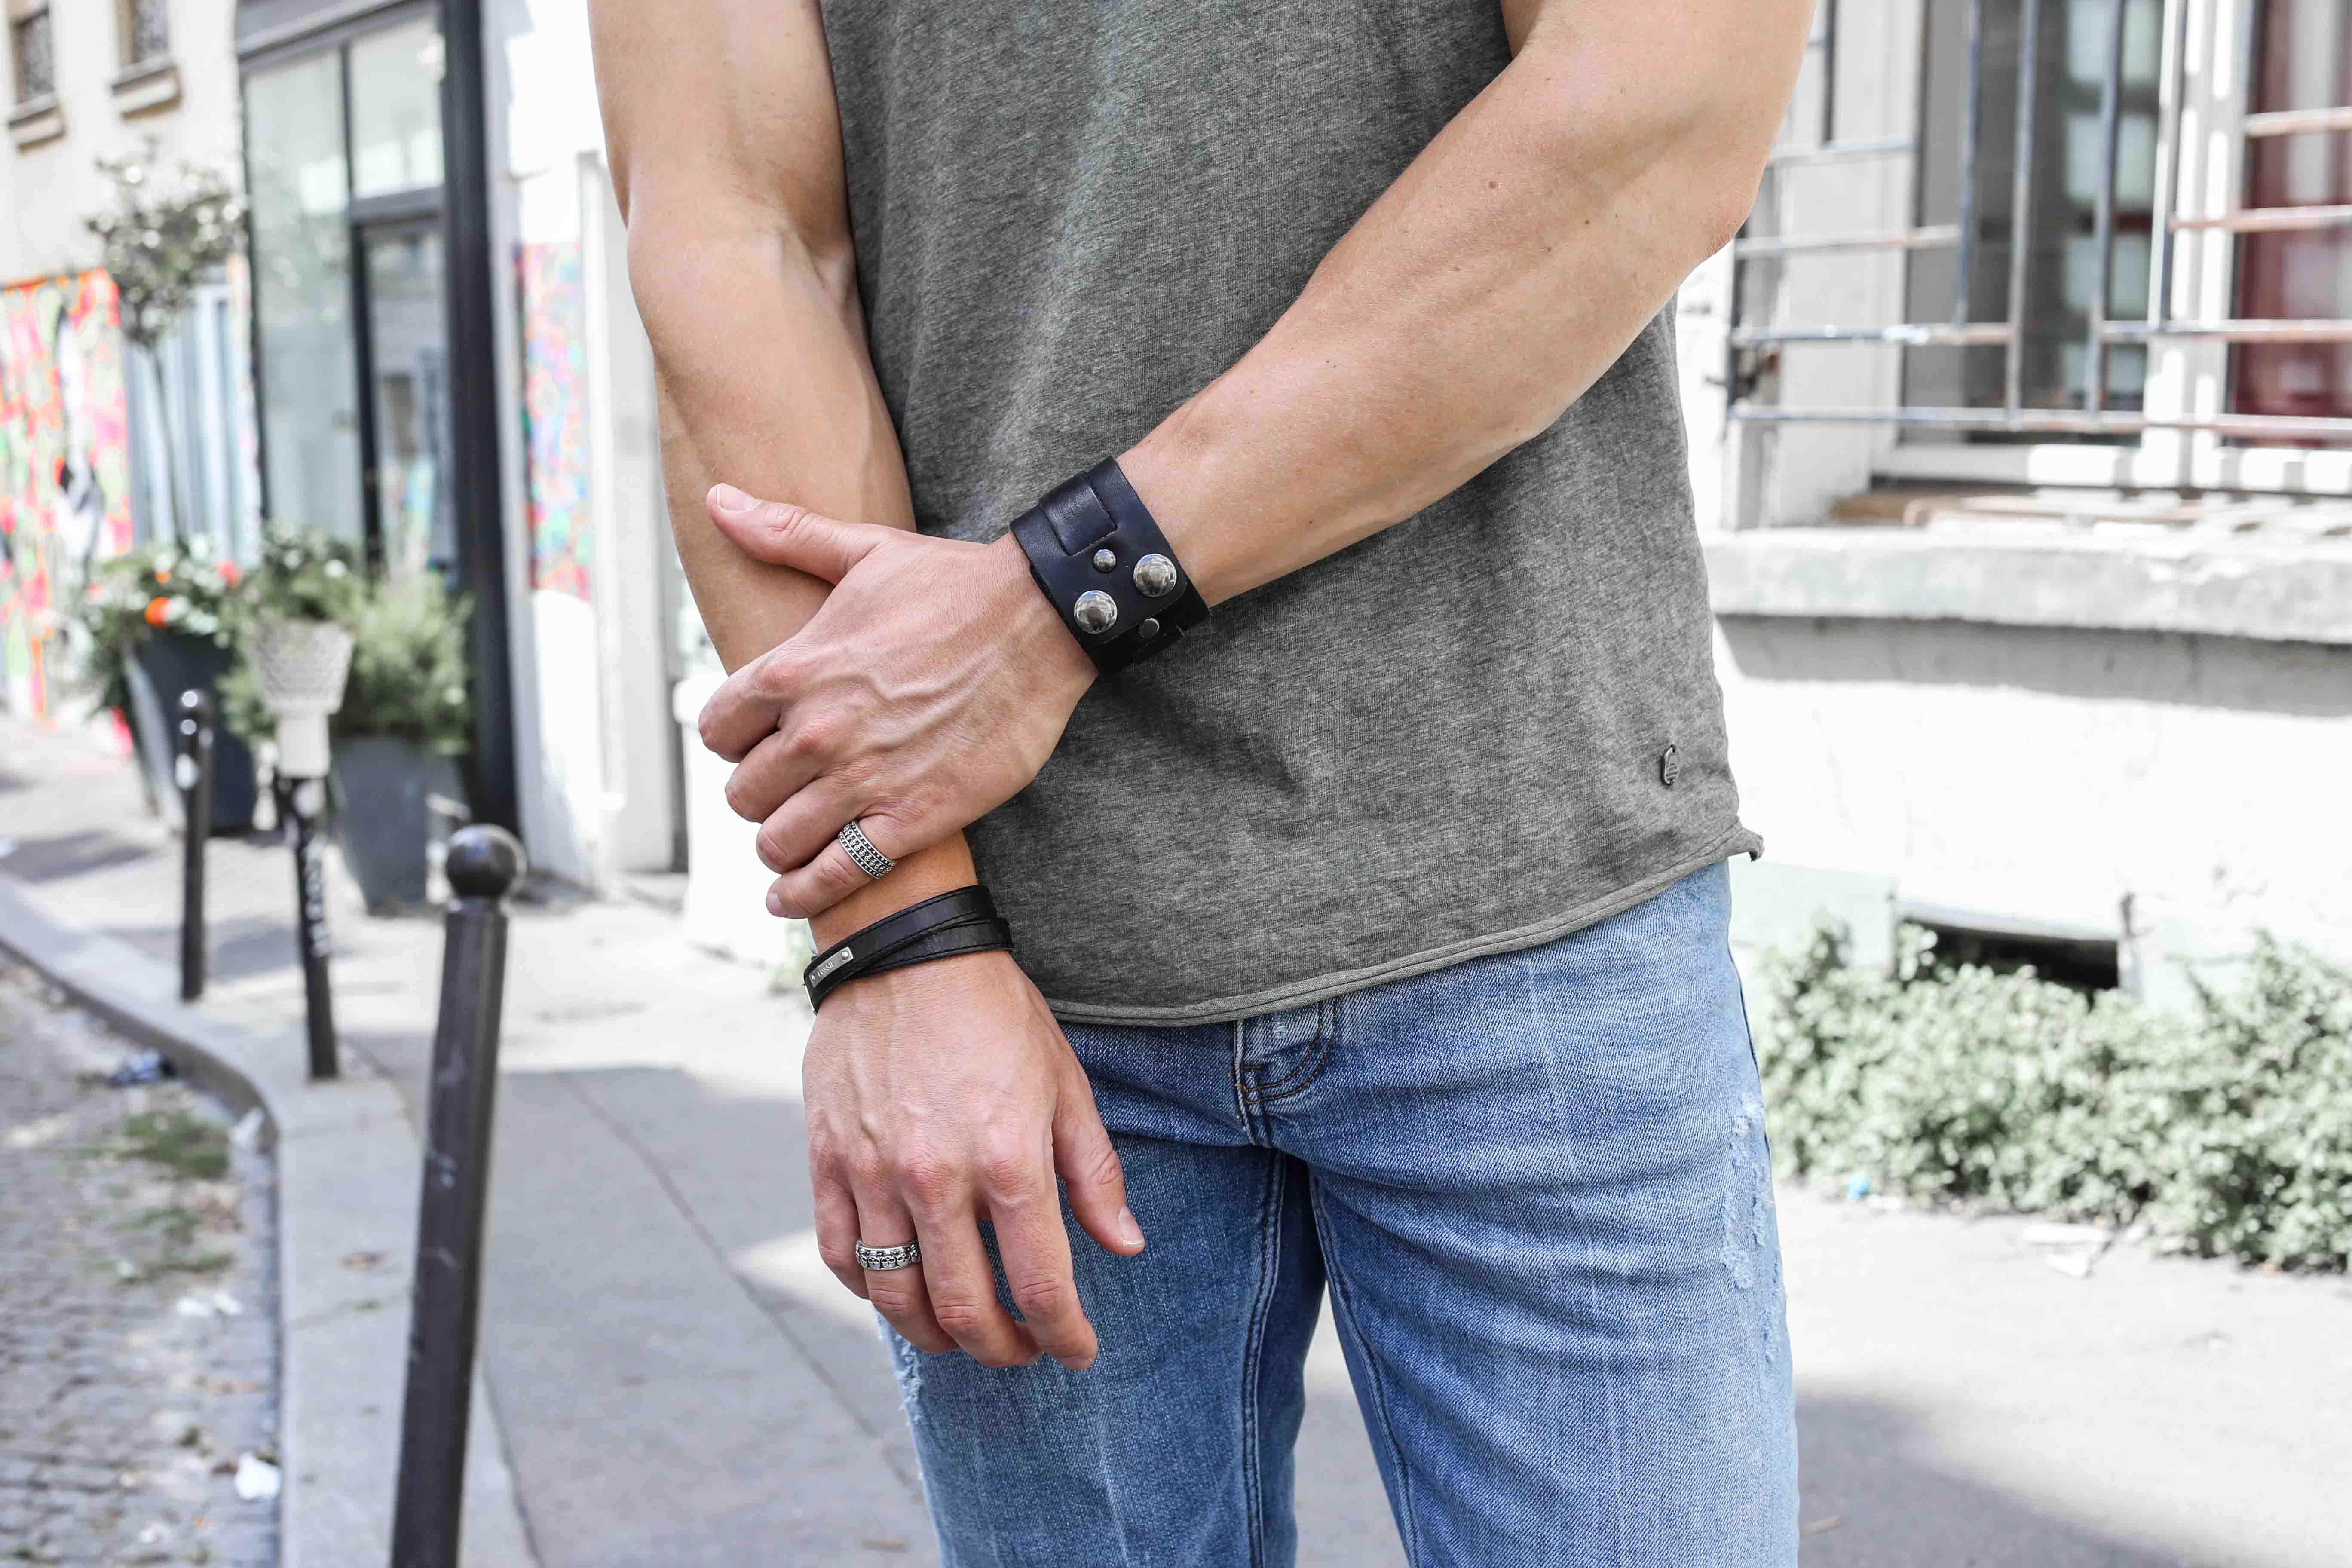 männerblog-modeblog-outfit-paris-basic-look-grünes-tshirt-ripped-jeans-nike-air-max-2017_2378